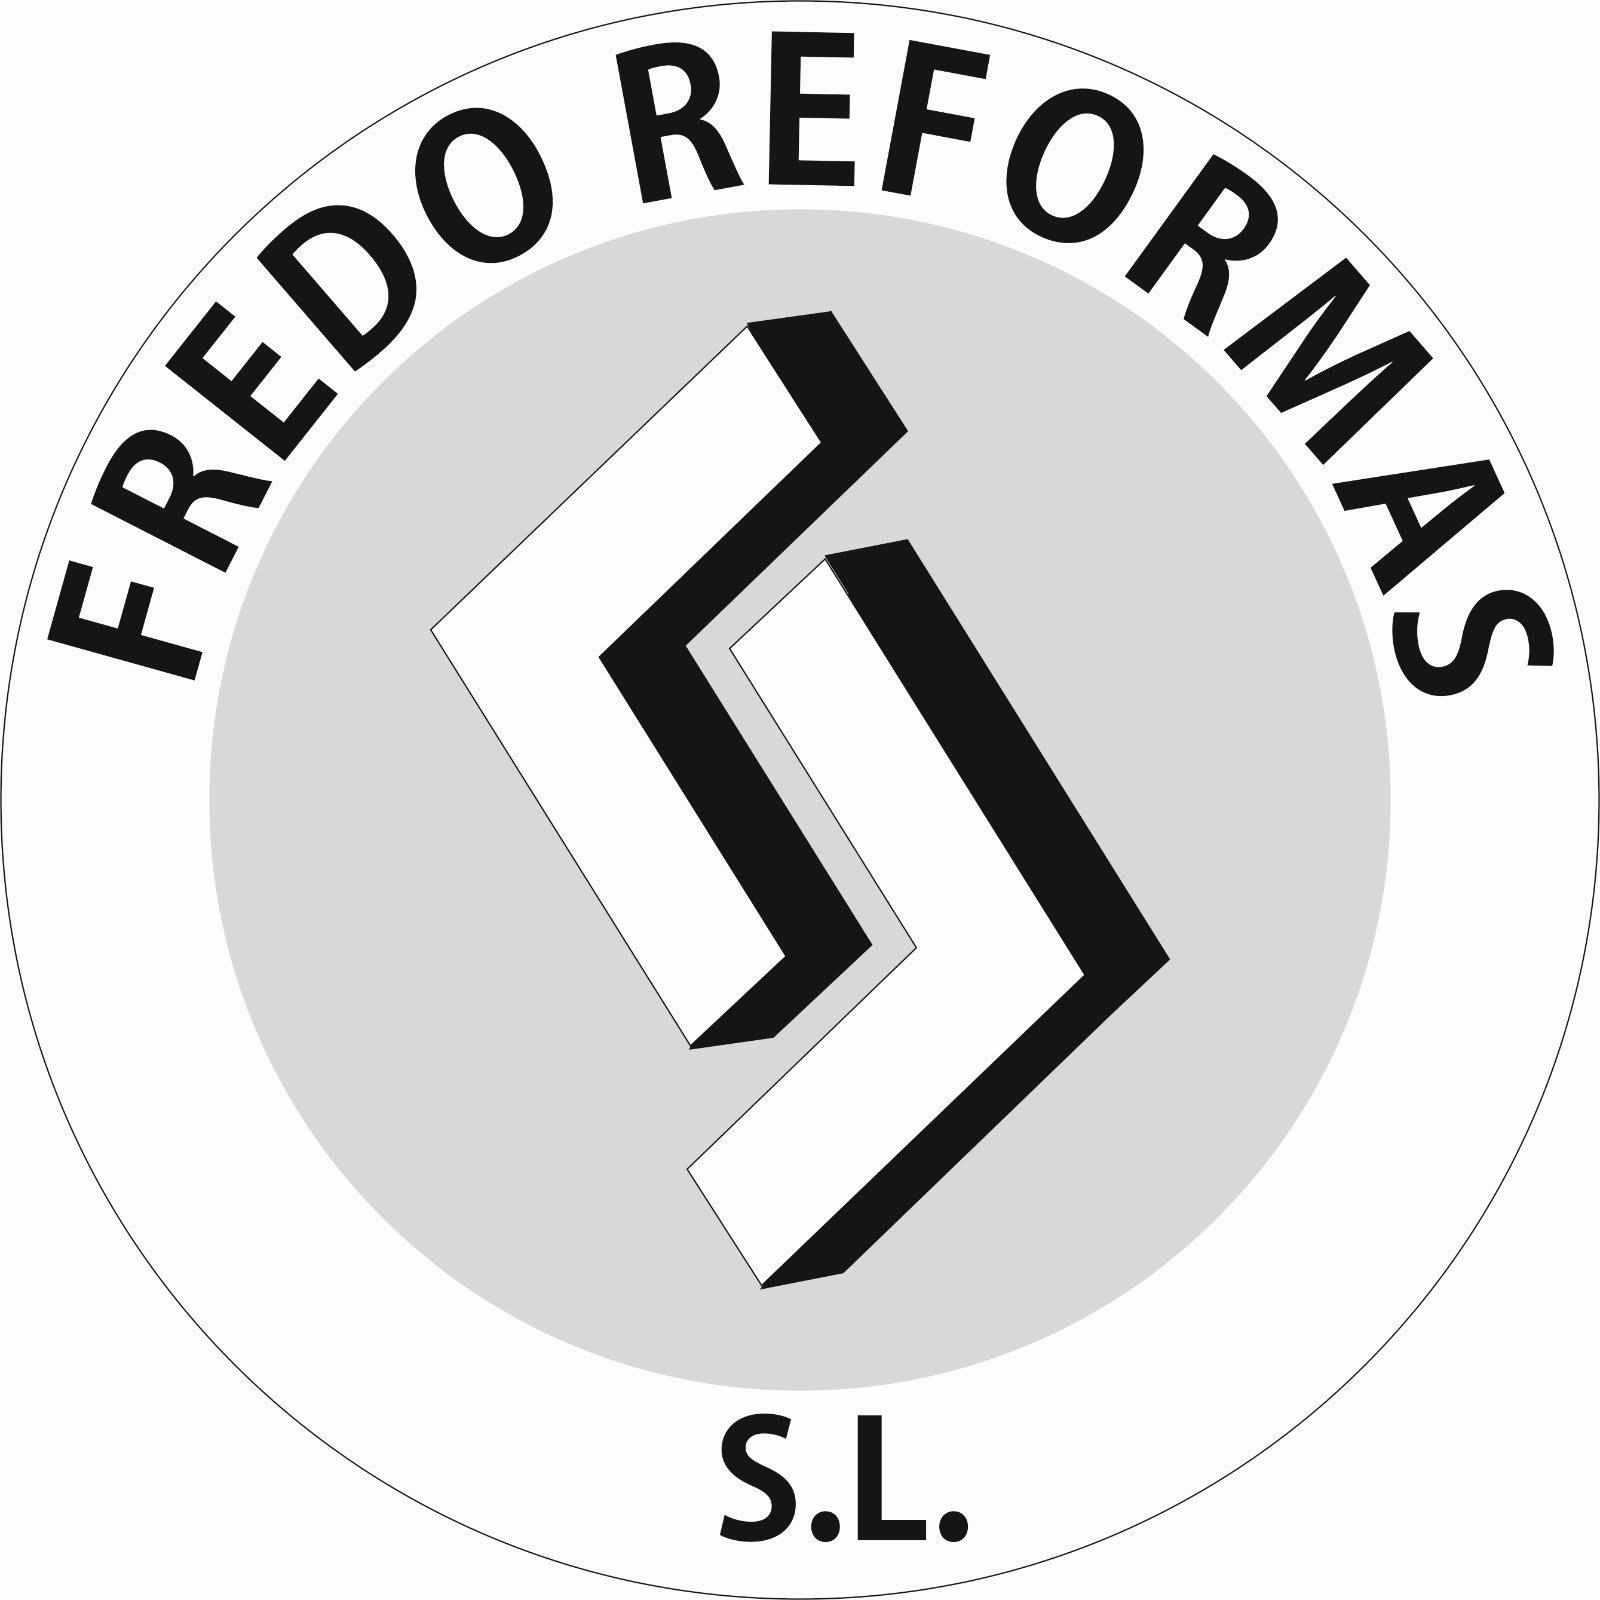 Fredo Reformas